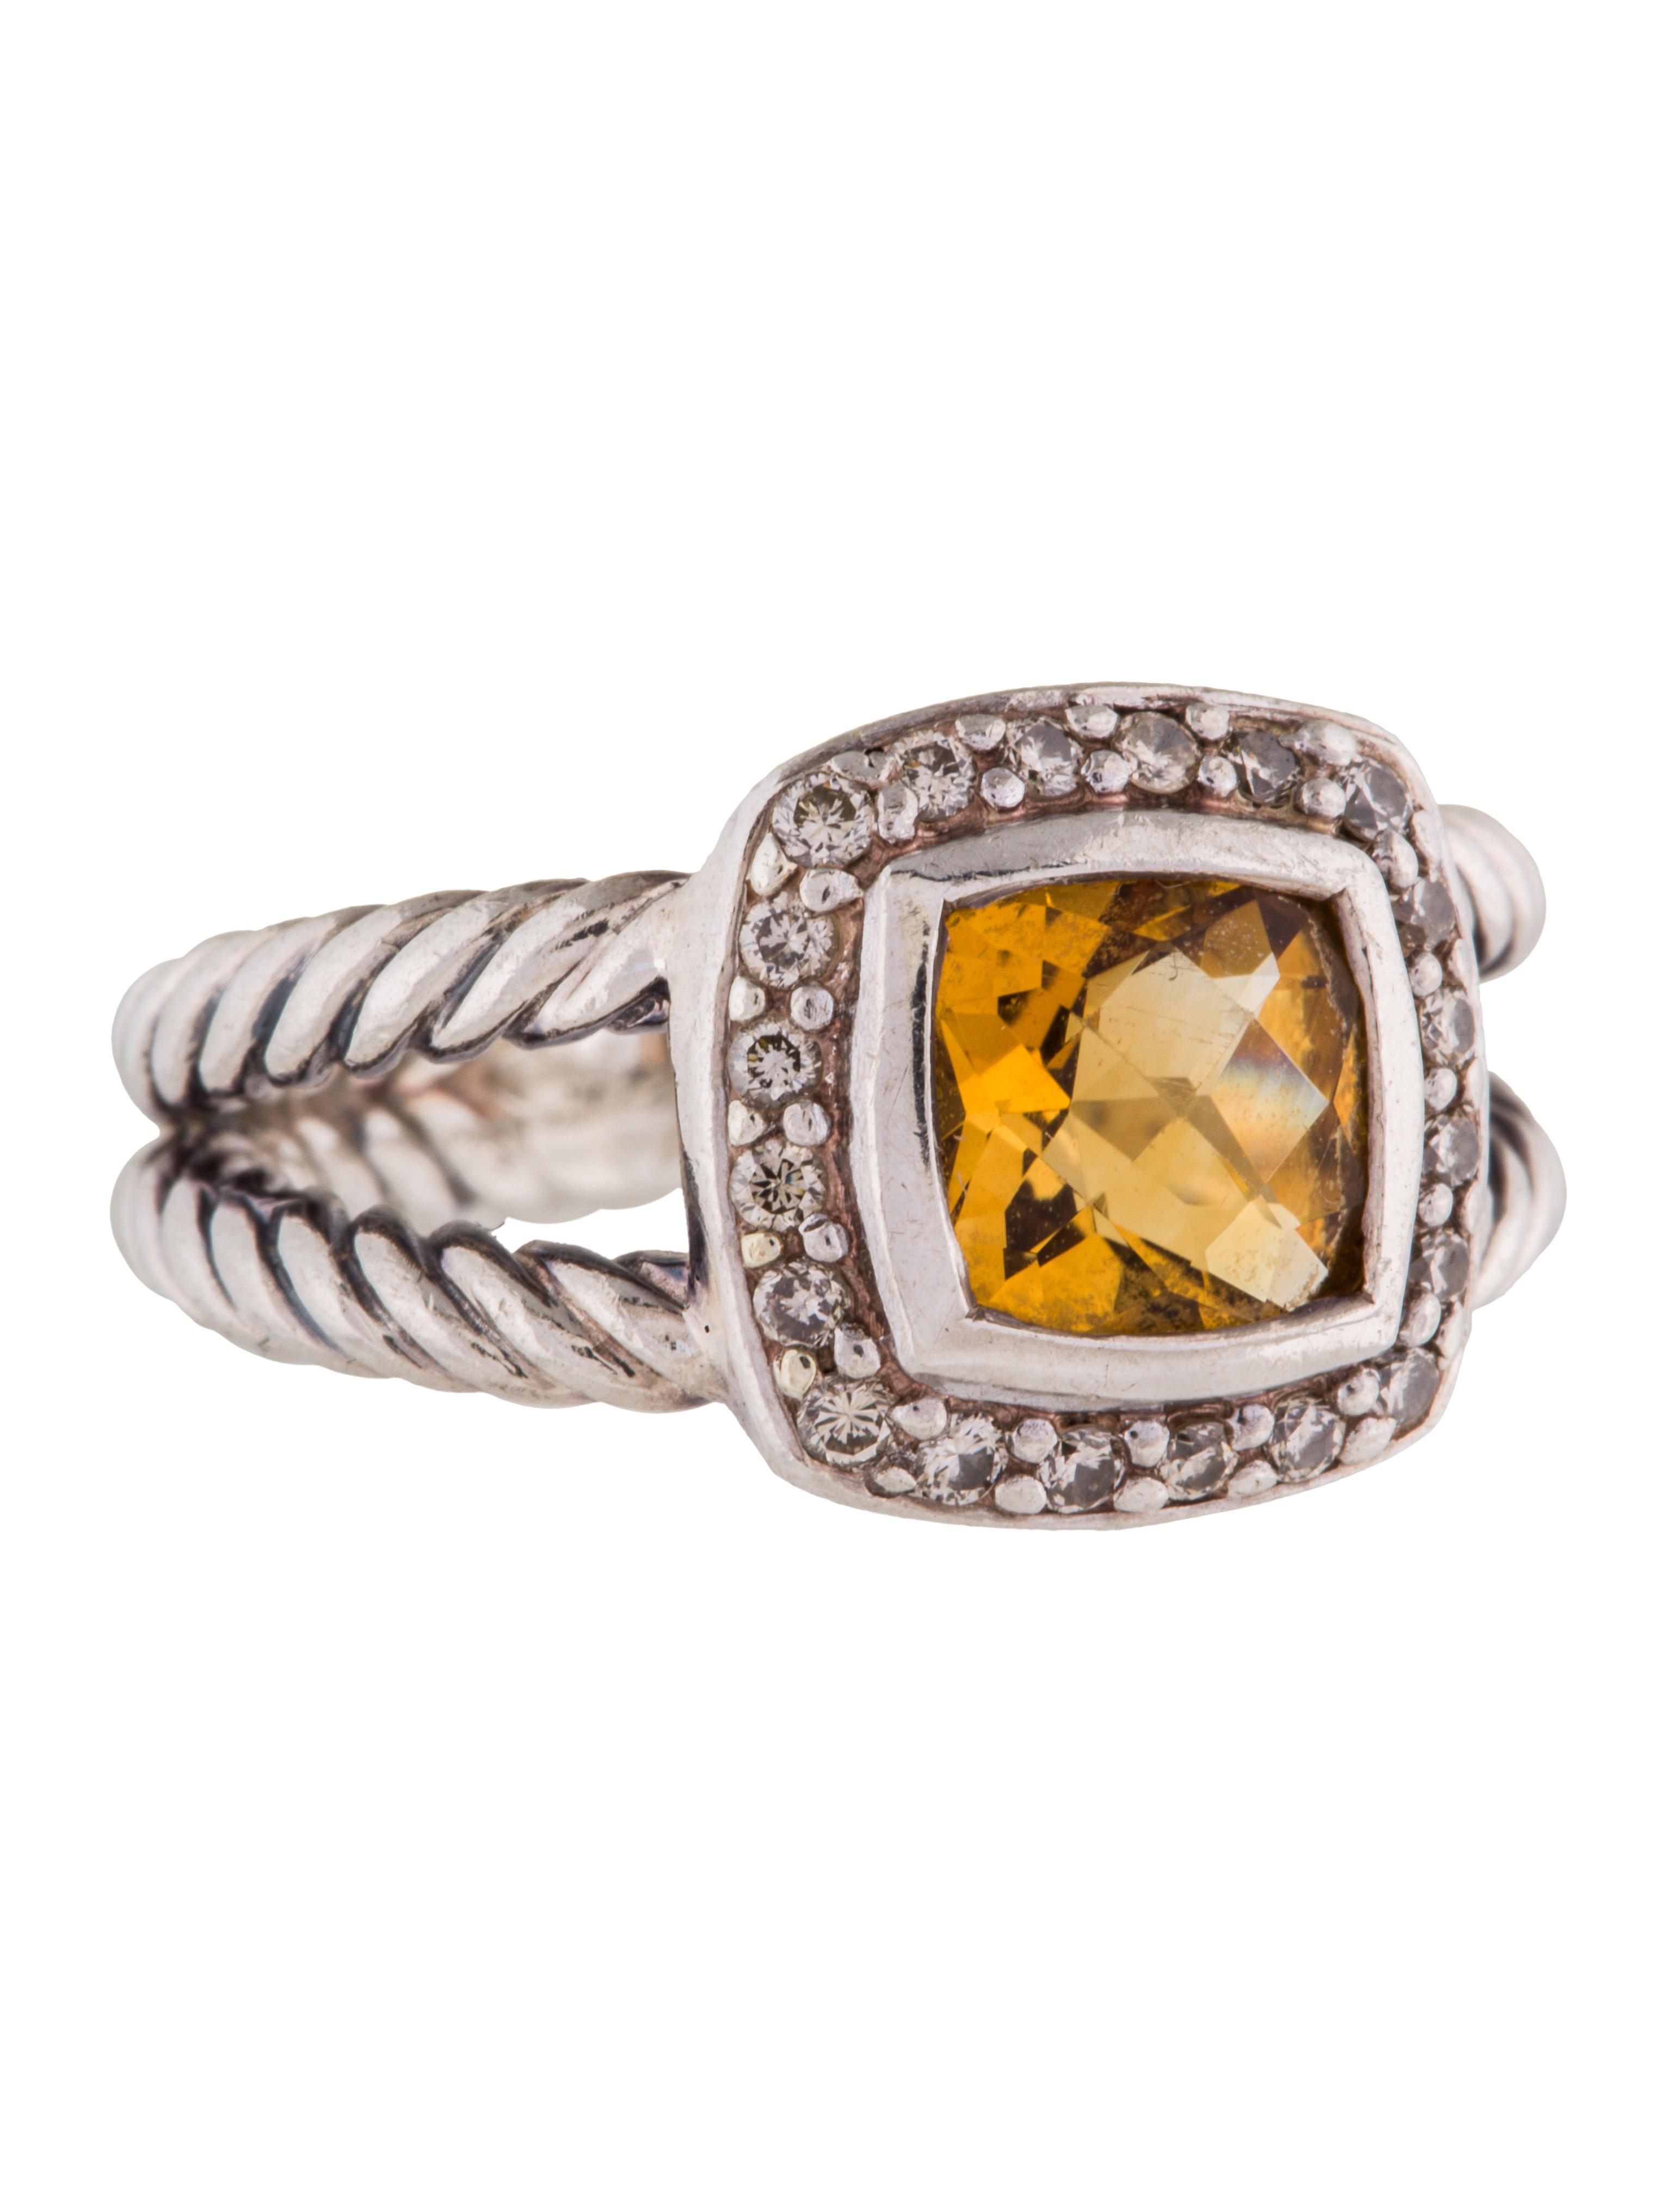 David yurman diamond citrine petite albion ring rings for David yurman inspired jewelry rings